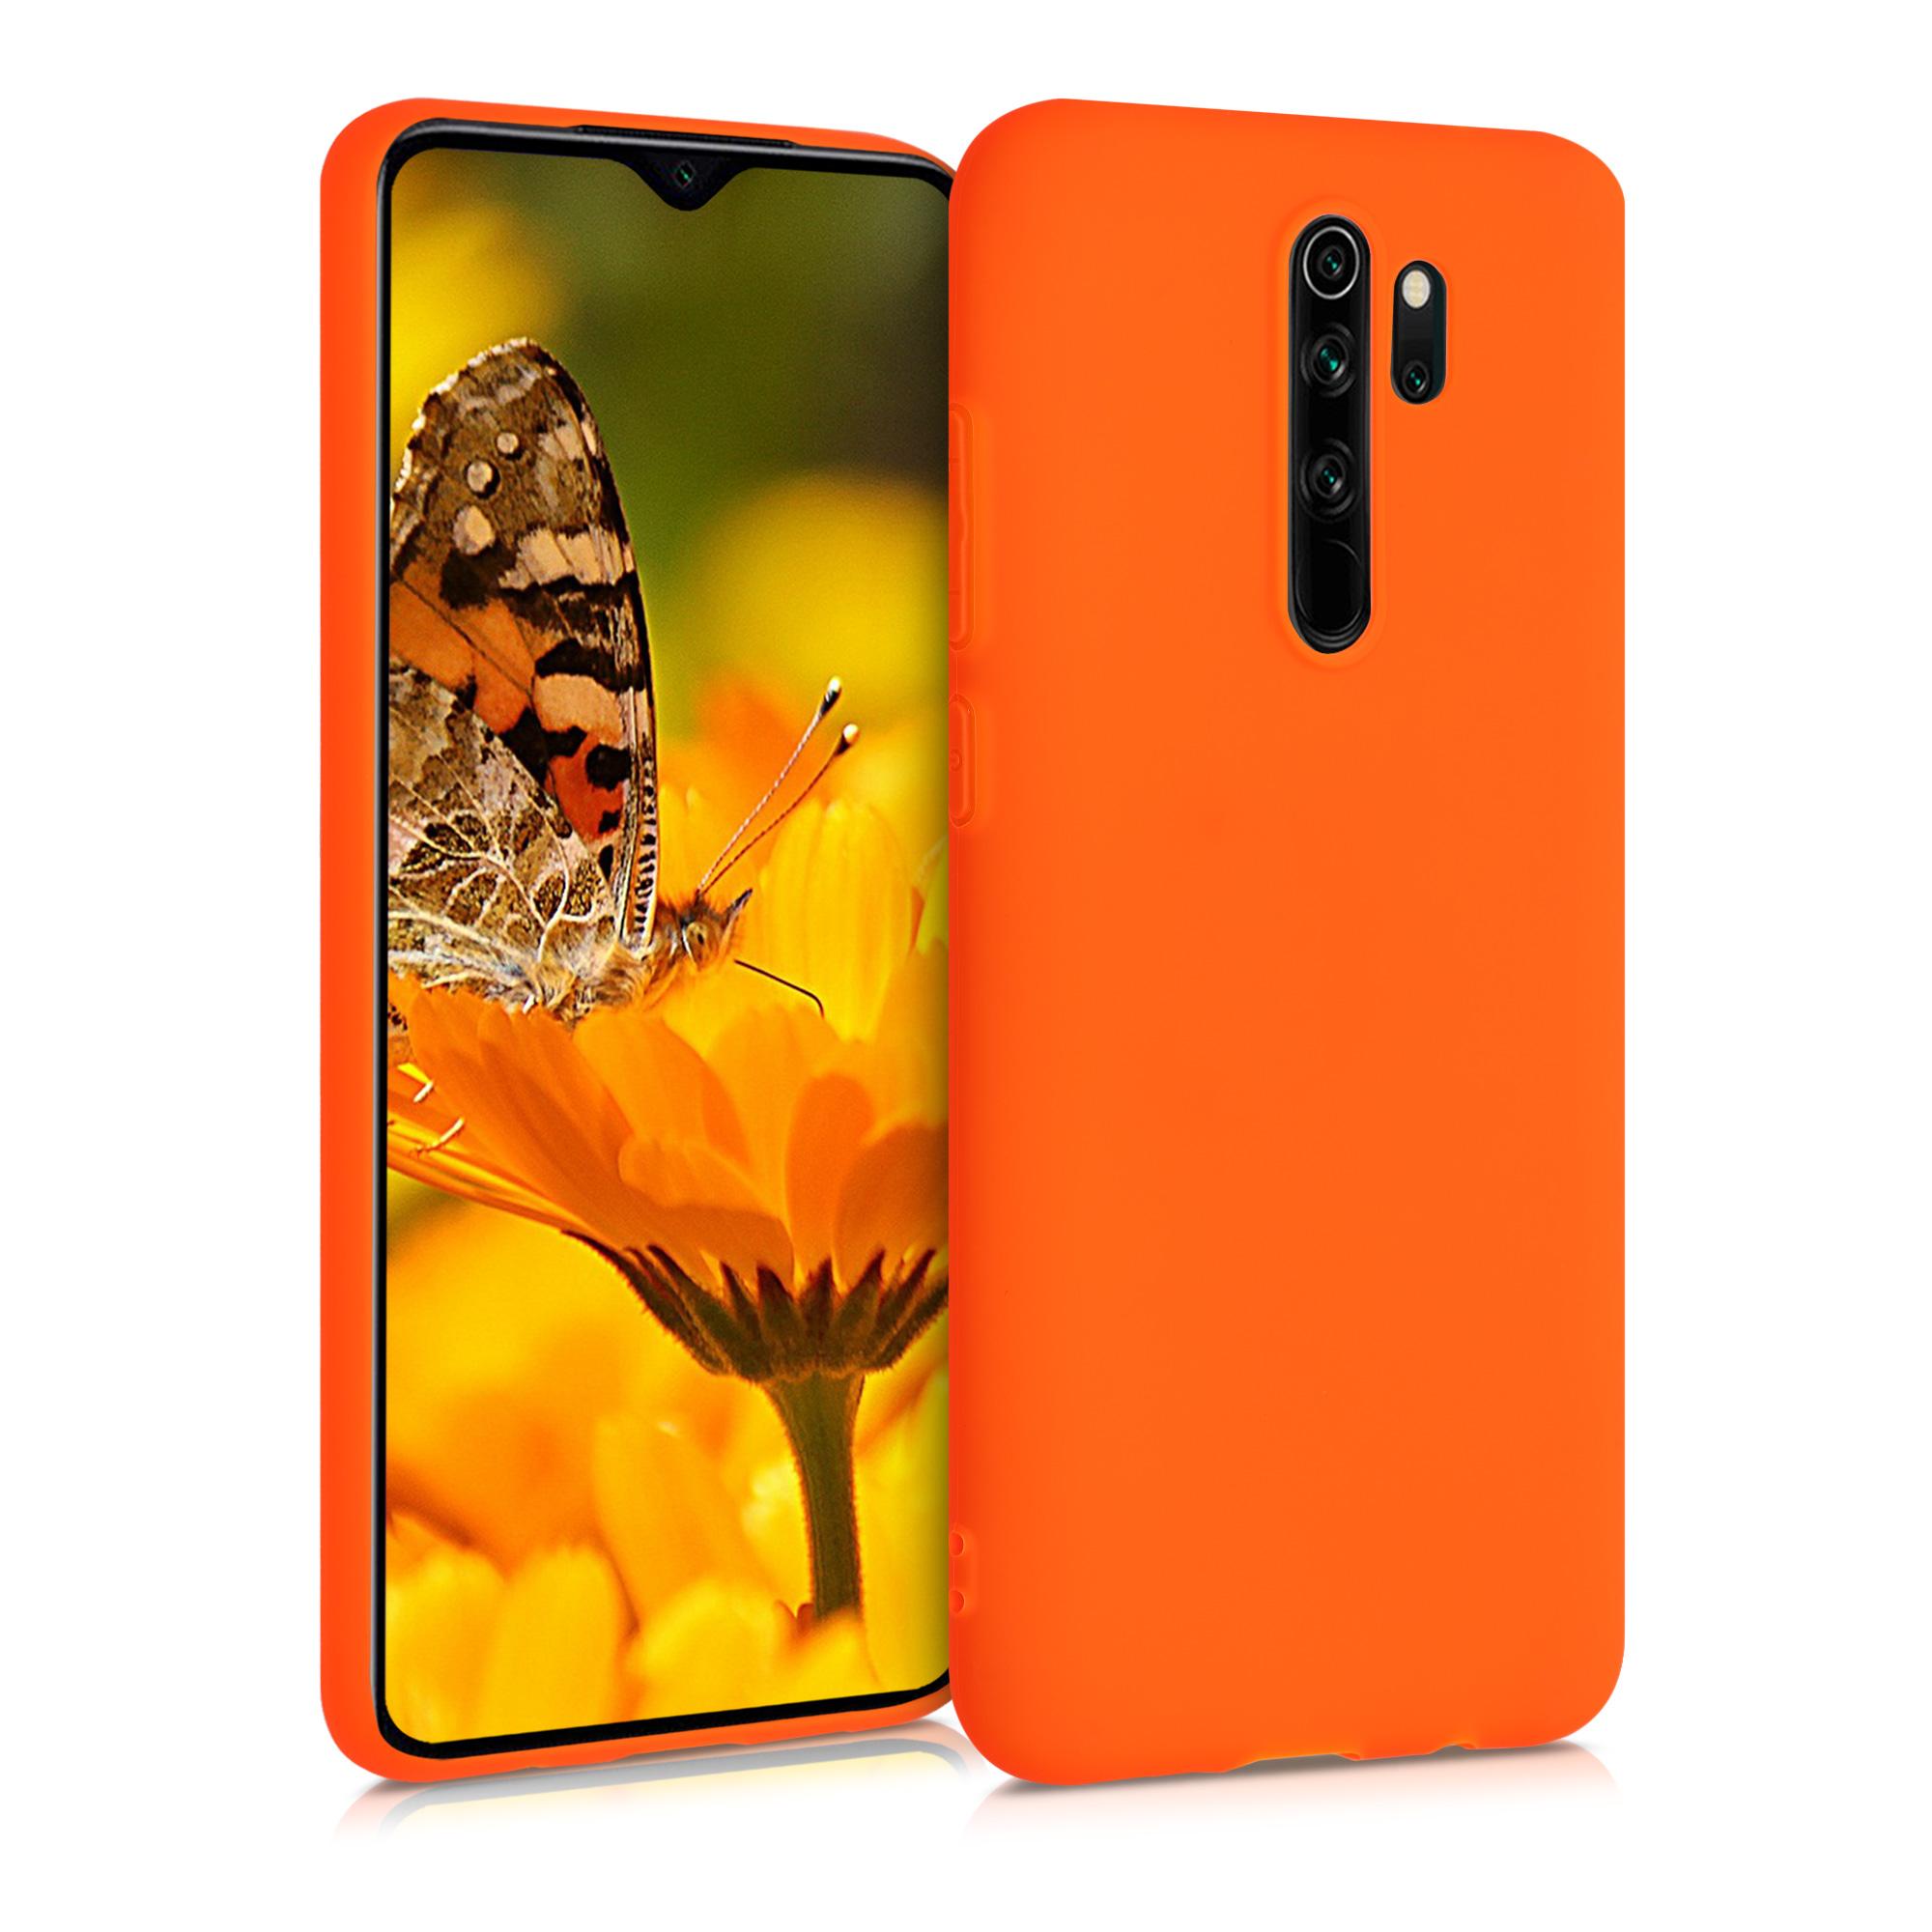 Kvalitní silikonové TPU pouzdro | obal pro Xiaomi Redmi Note 8 Pro - Neon Orange